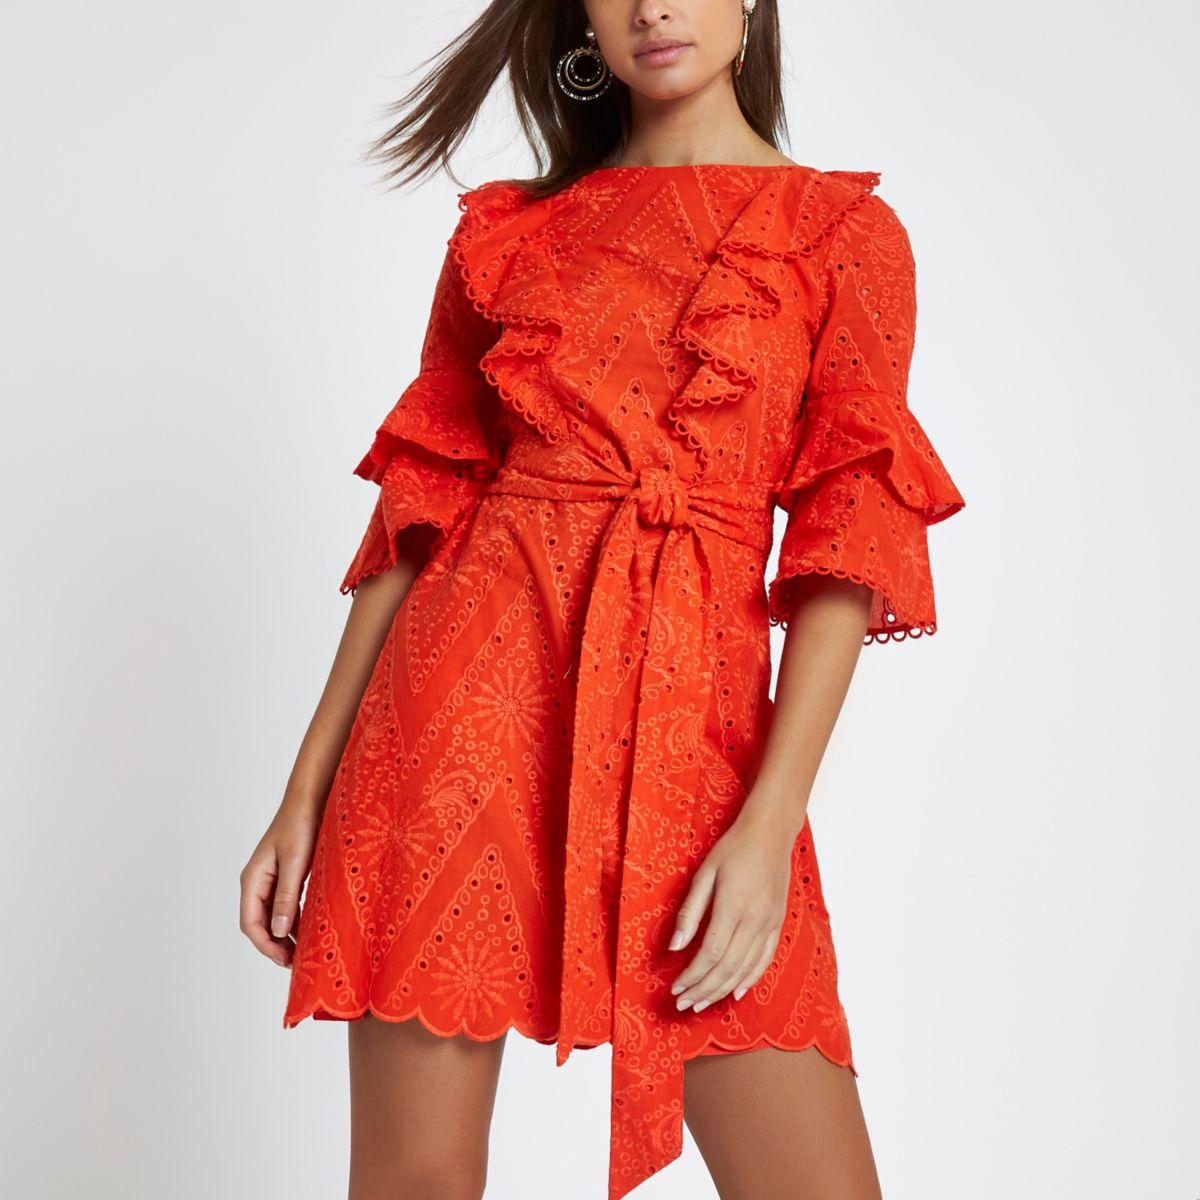 Red lace frill tie waist dress - Dresses - Sale - women